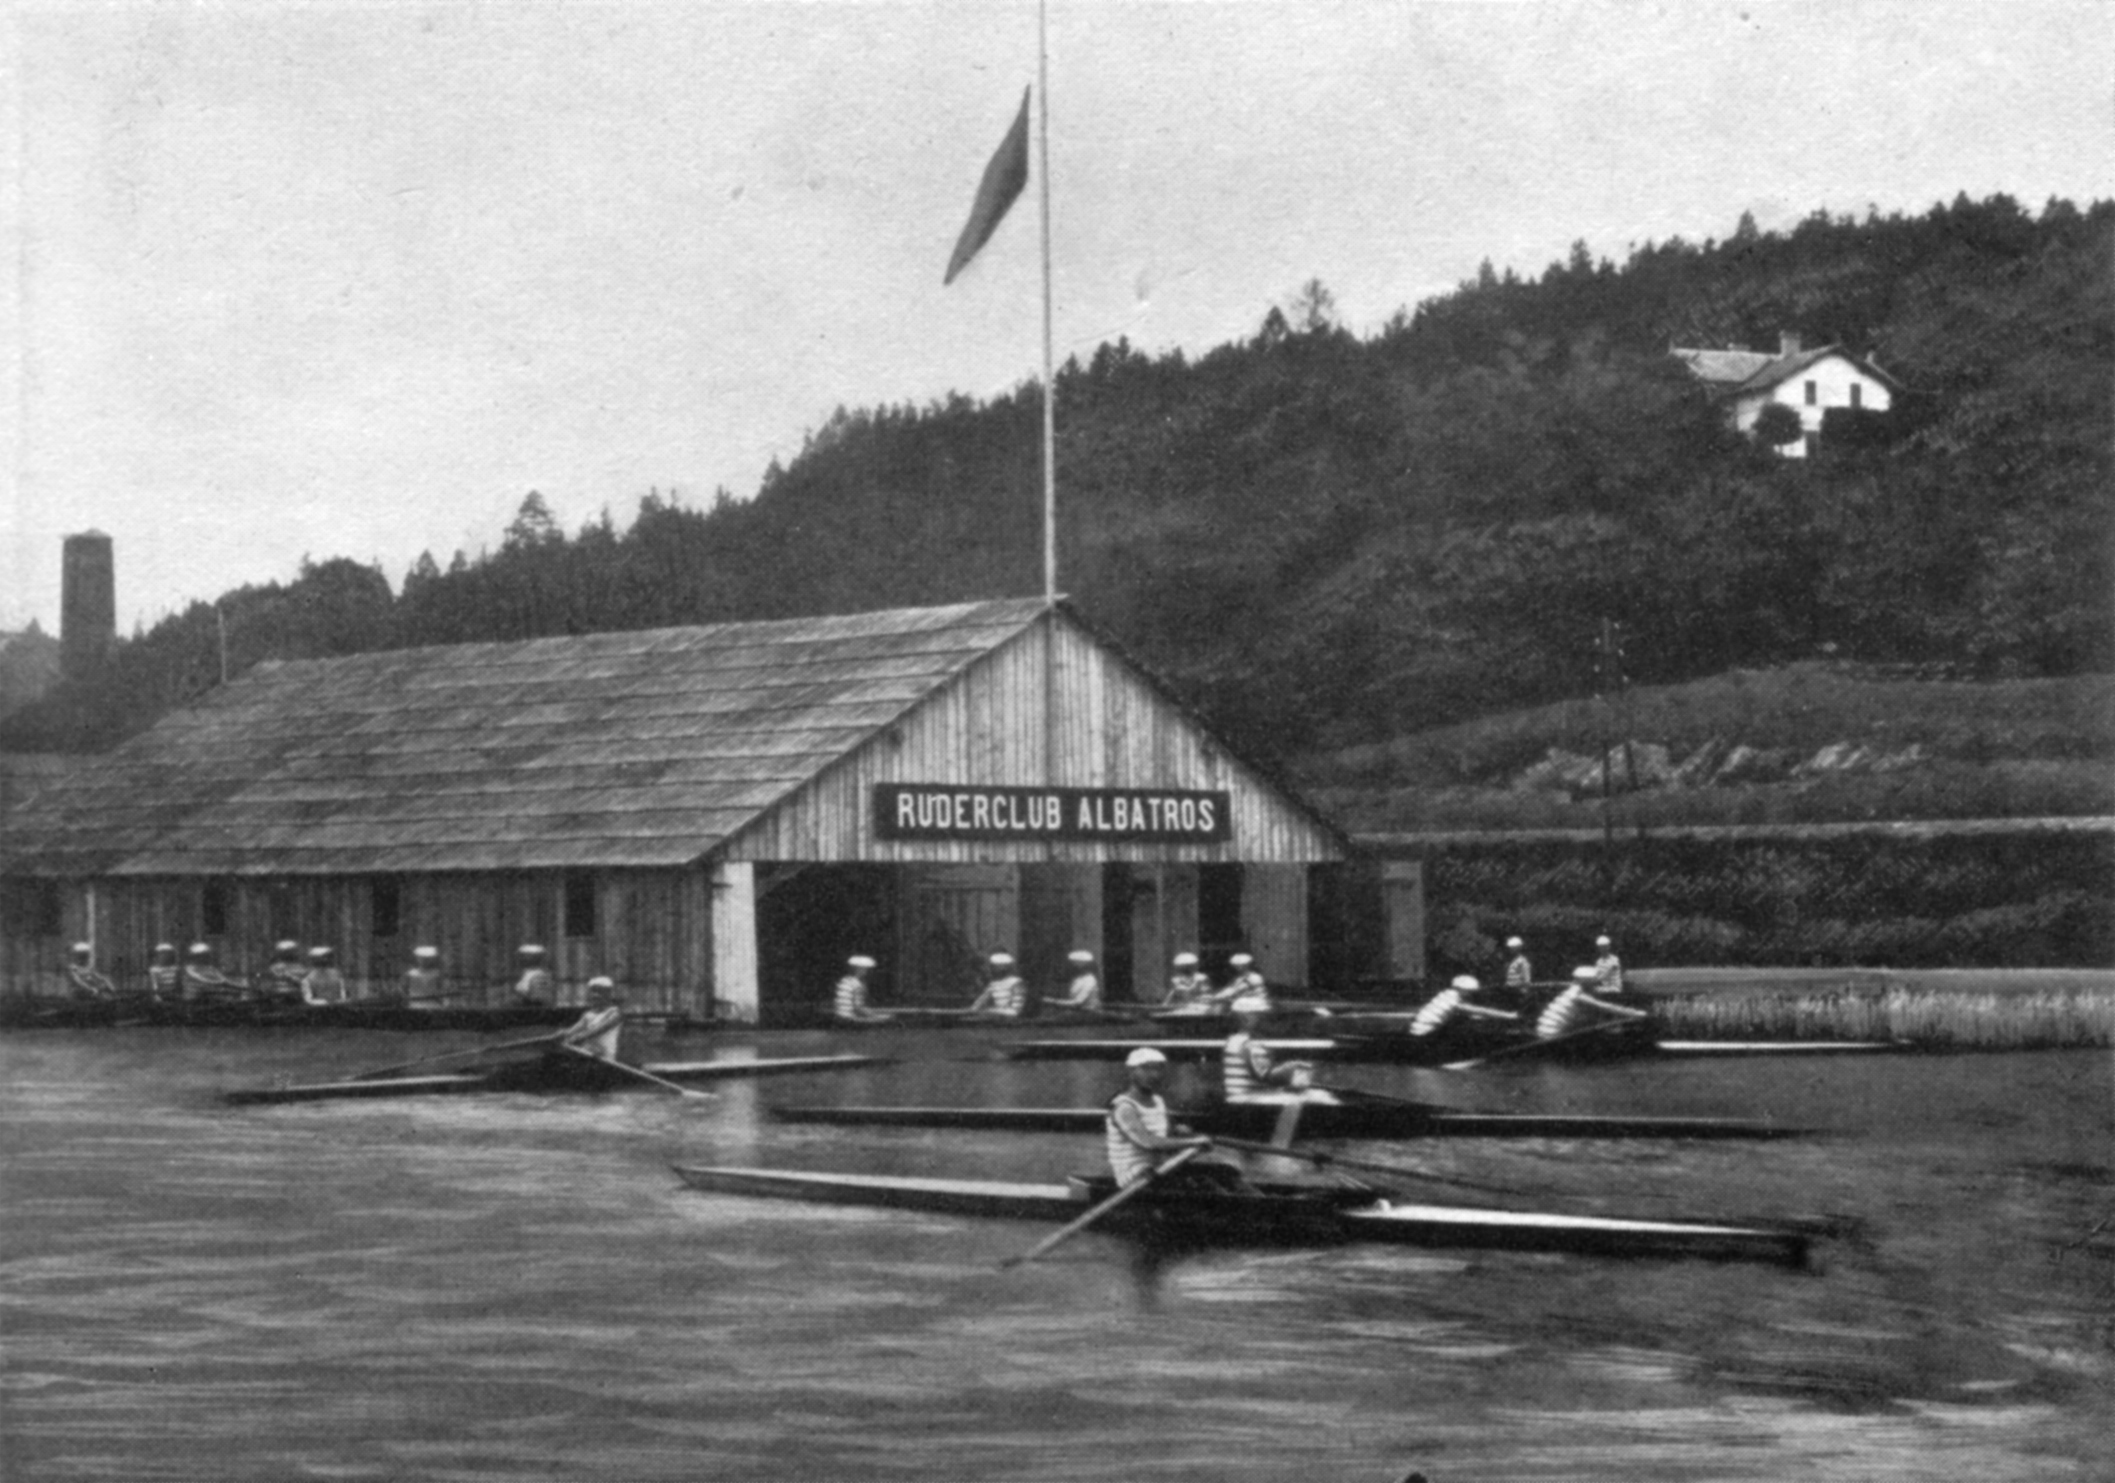 RV-Albatros | erstes Bootshaus | 1882